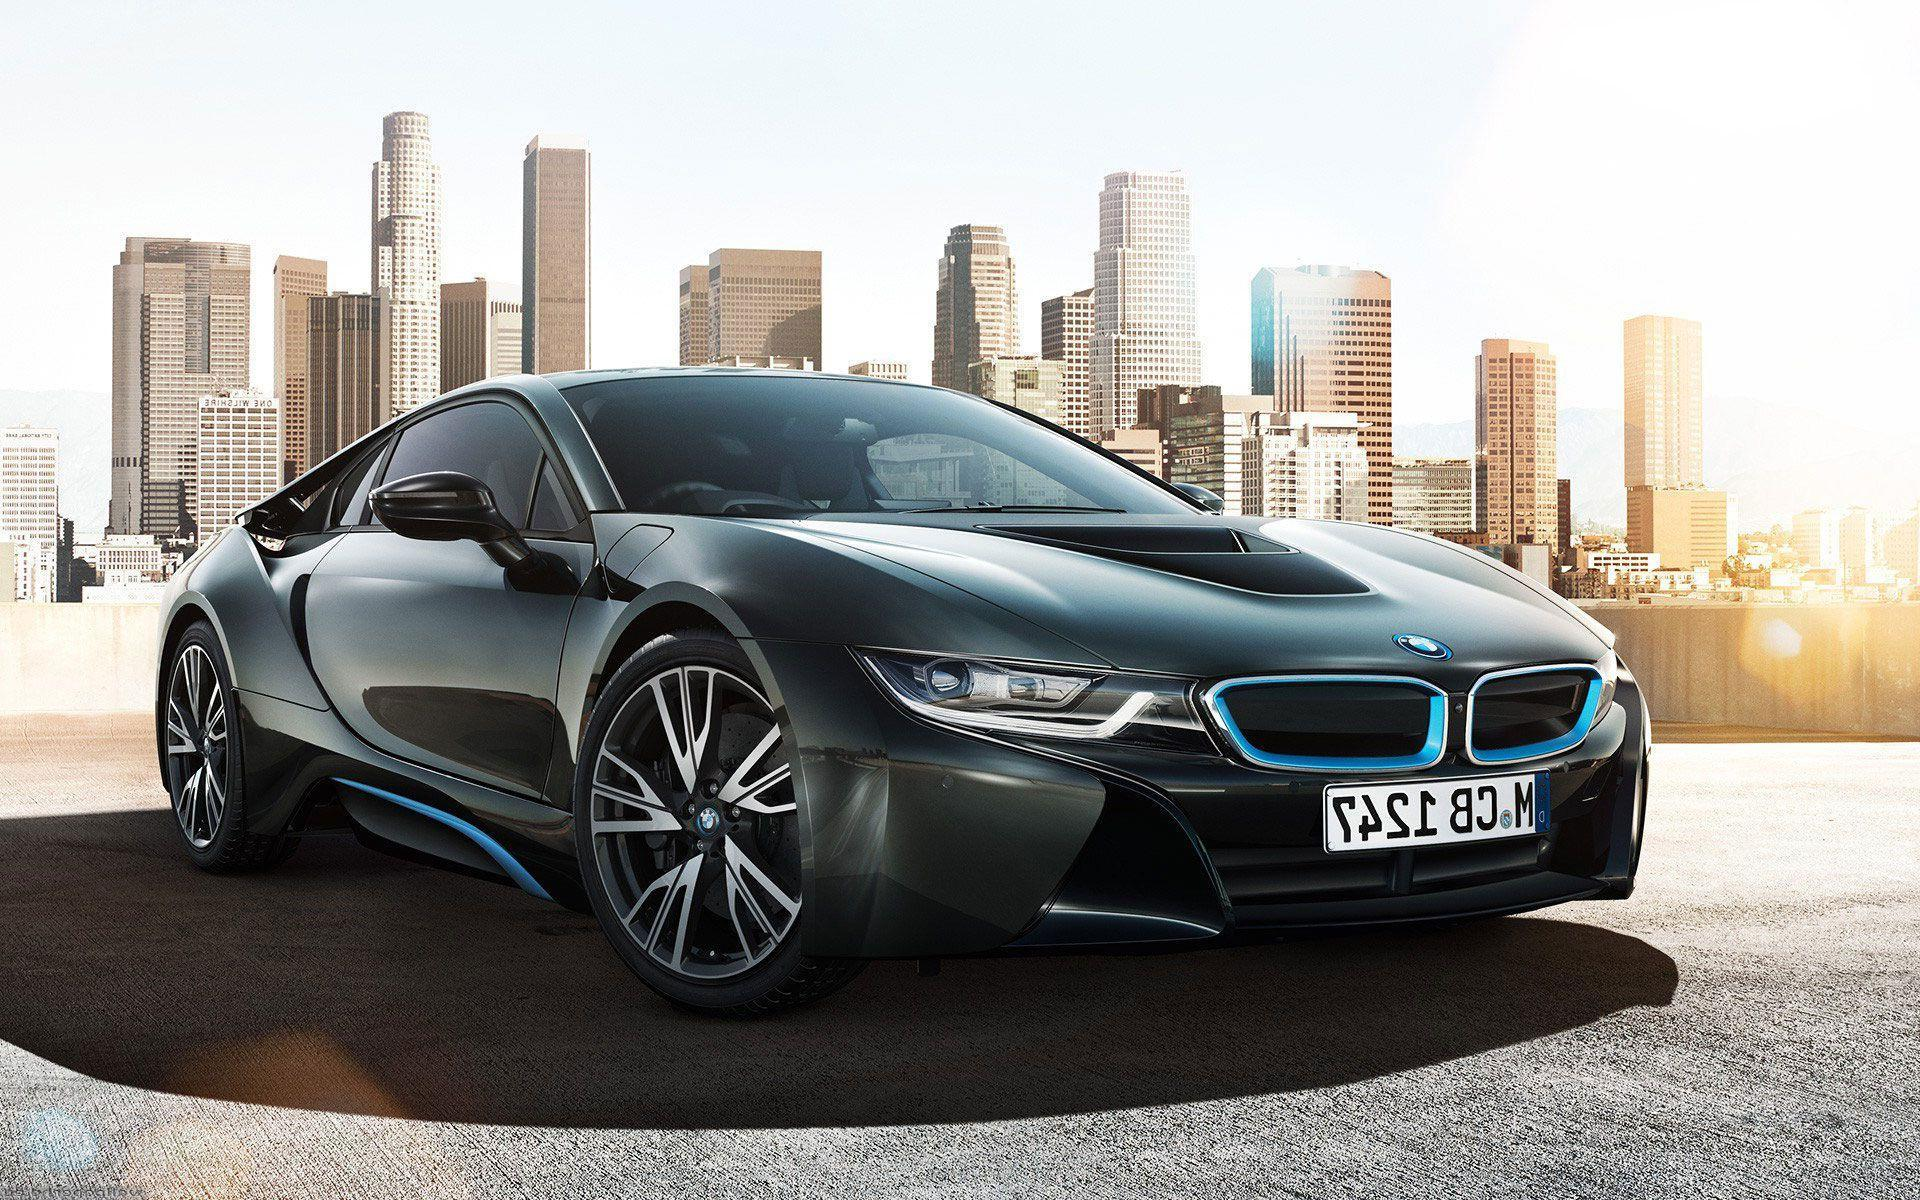 Bmw I8 Car Concept 4k Hd Desktop Wallpaper For 4k Ultra Hd: BMW I8 Wallpapers